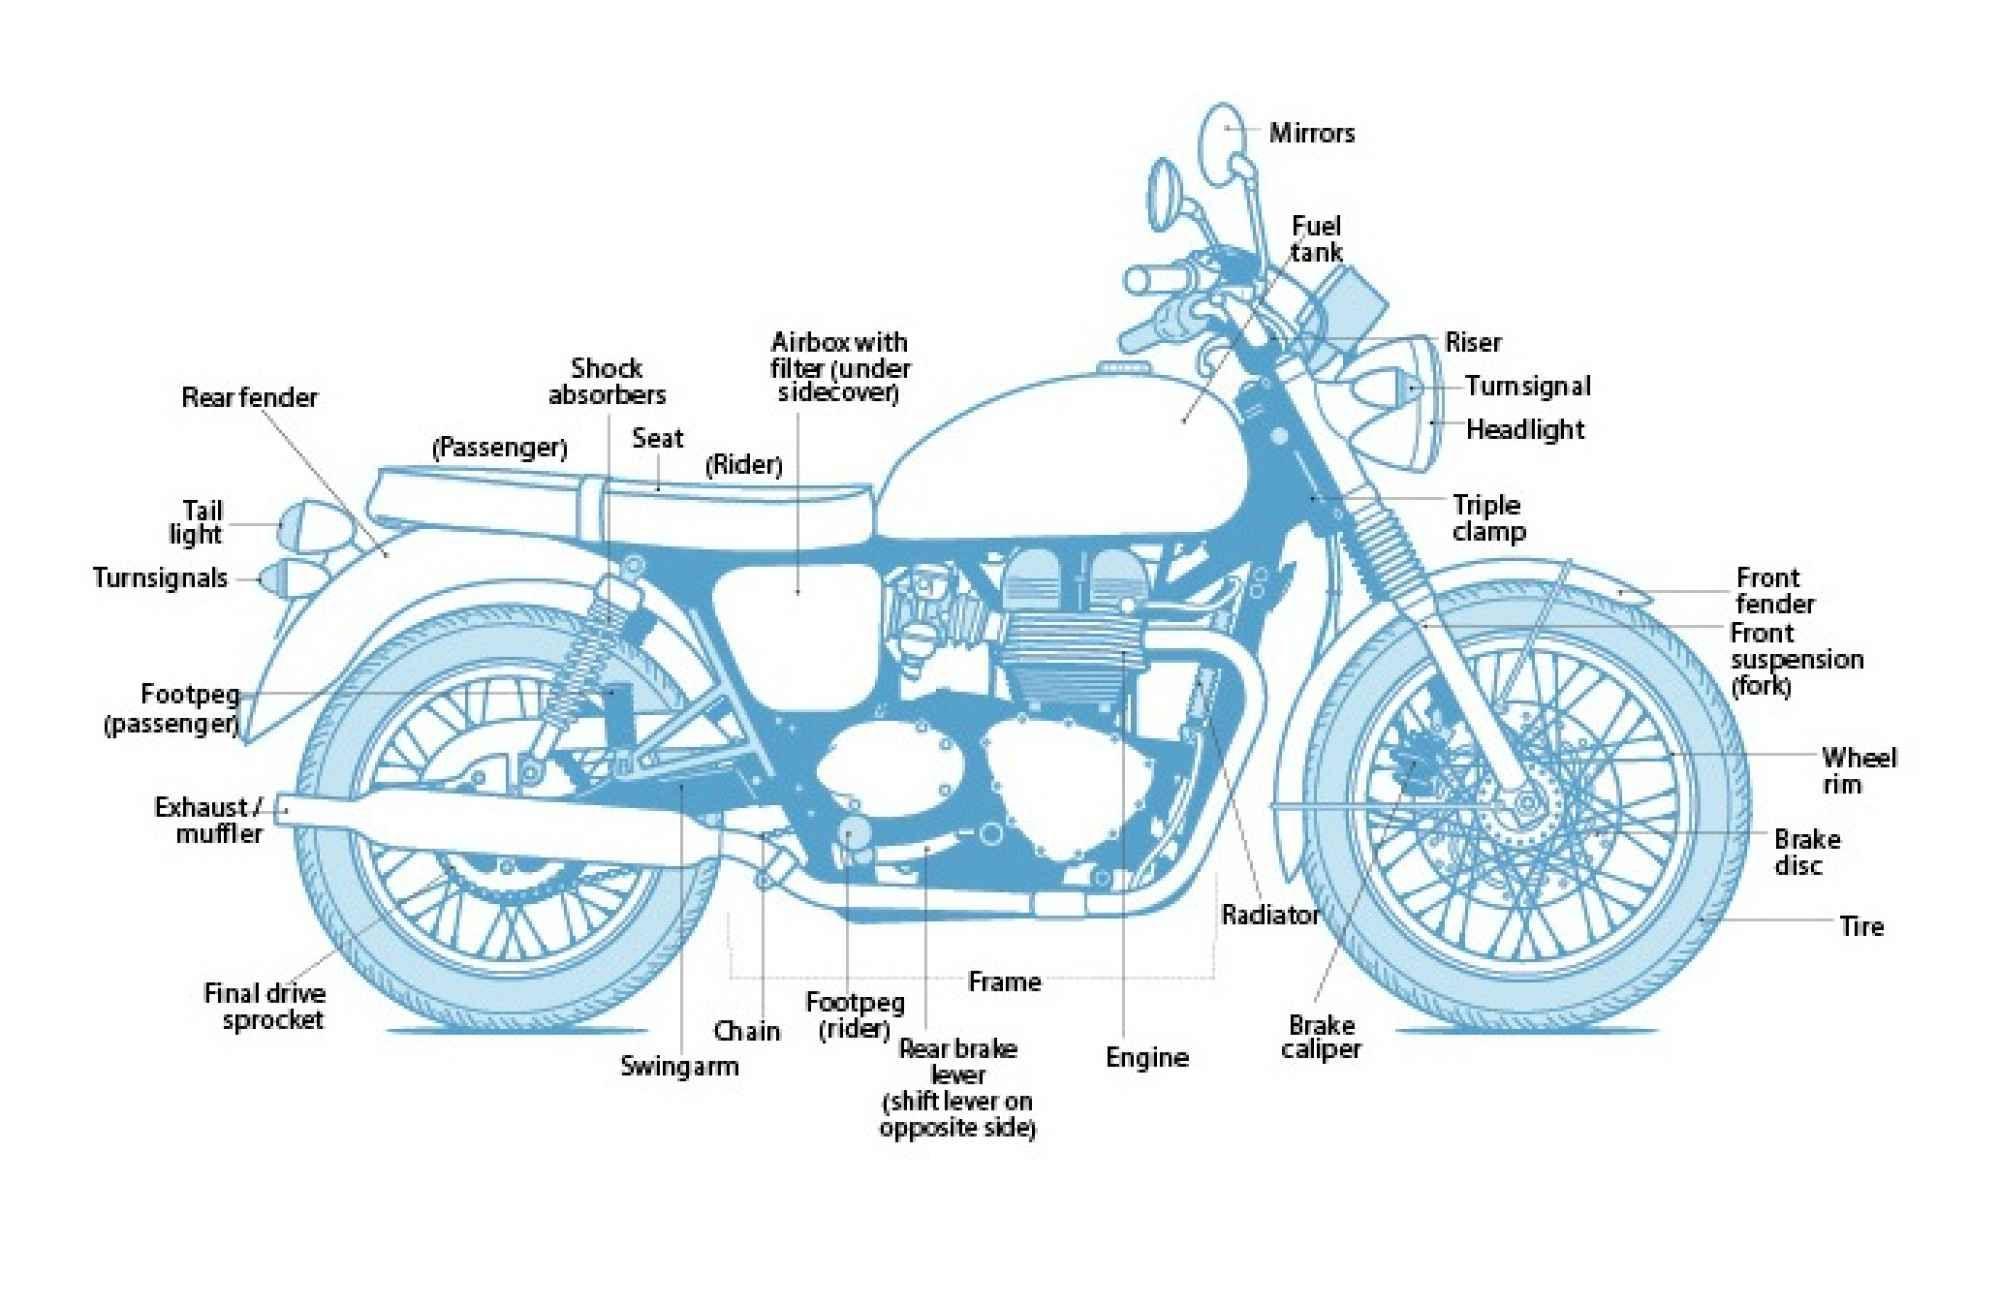 motorcycle diagram motorcycles motorcycle cafe racer bikes harley davidson motorcycle parts diagram [ 2000 x 1308 Pixel ]